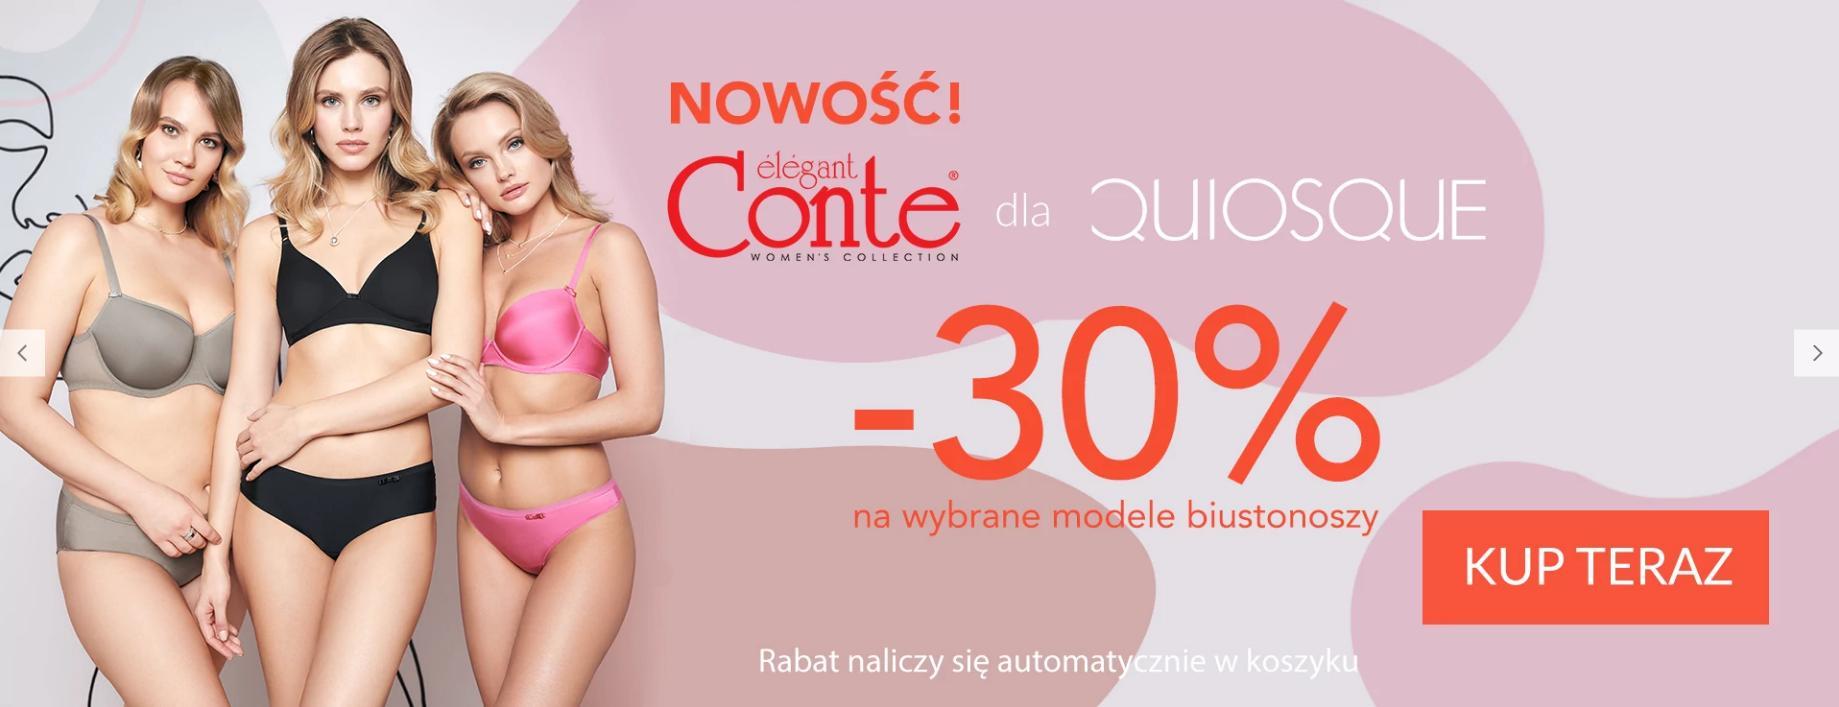 Quiosque Quiosque: 30% rabatu na wybrane modele biustonoszy marki elegant Conte